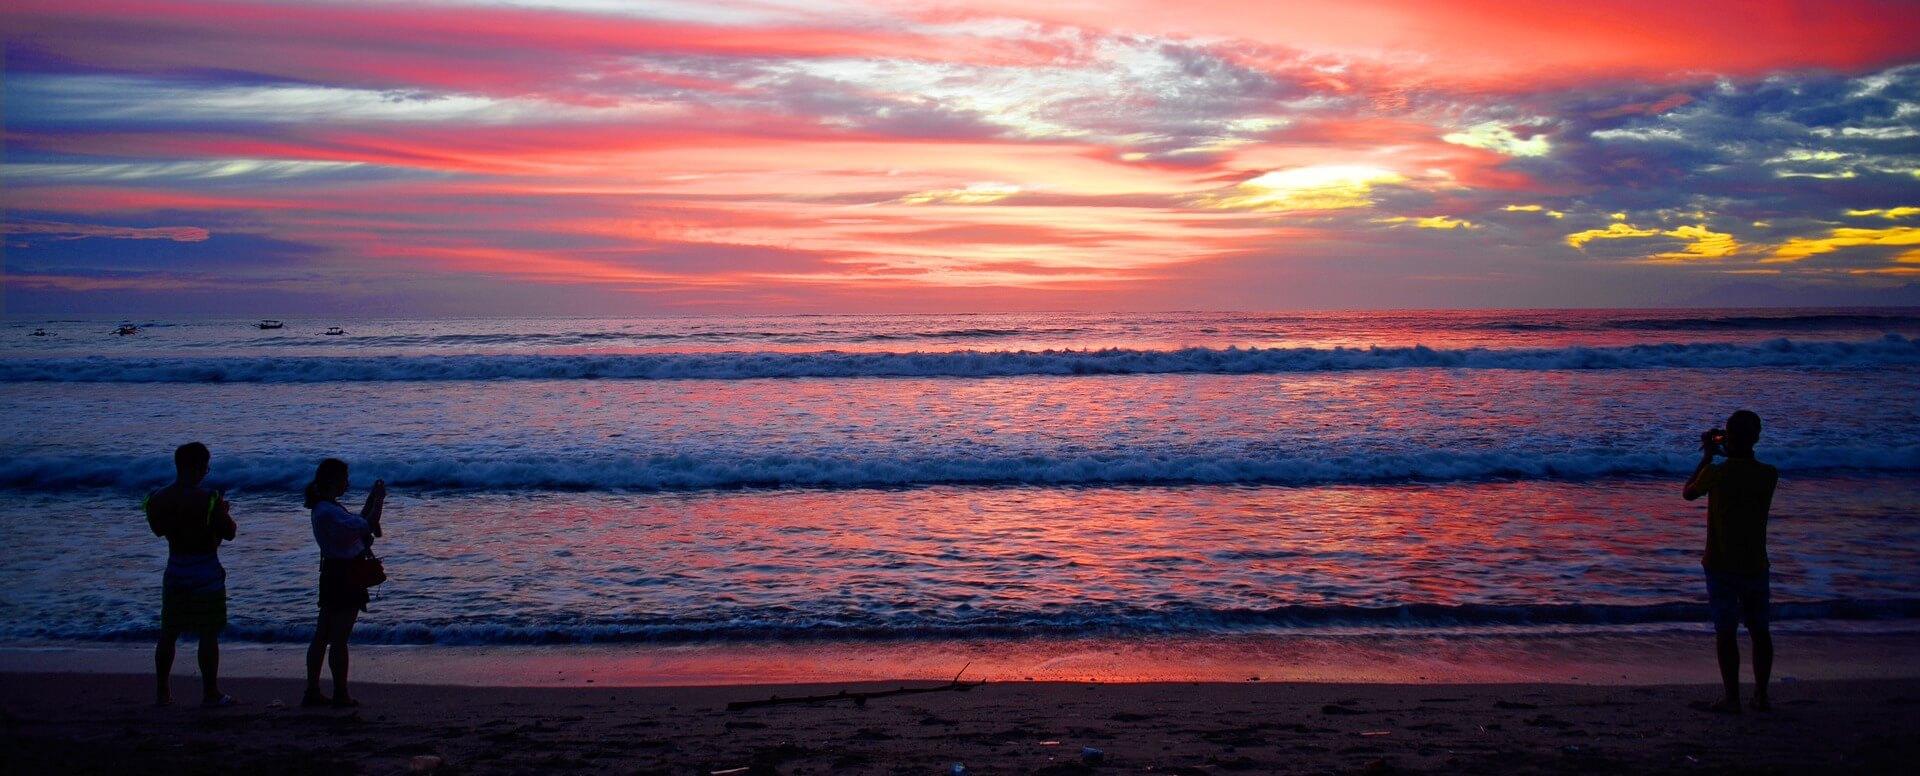 10- Les plages de Canggu - Bali